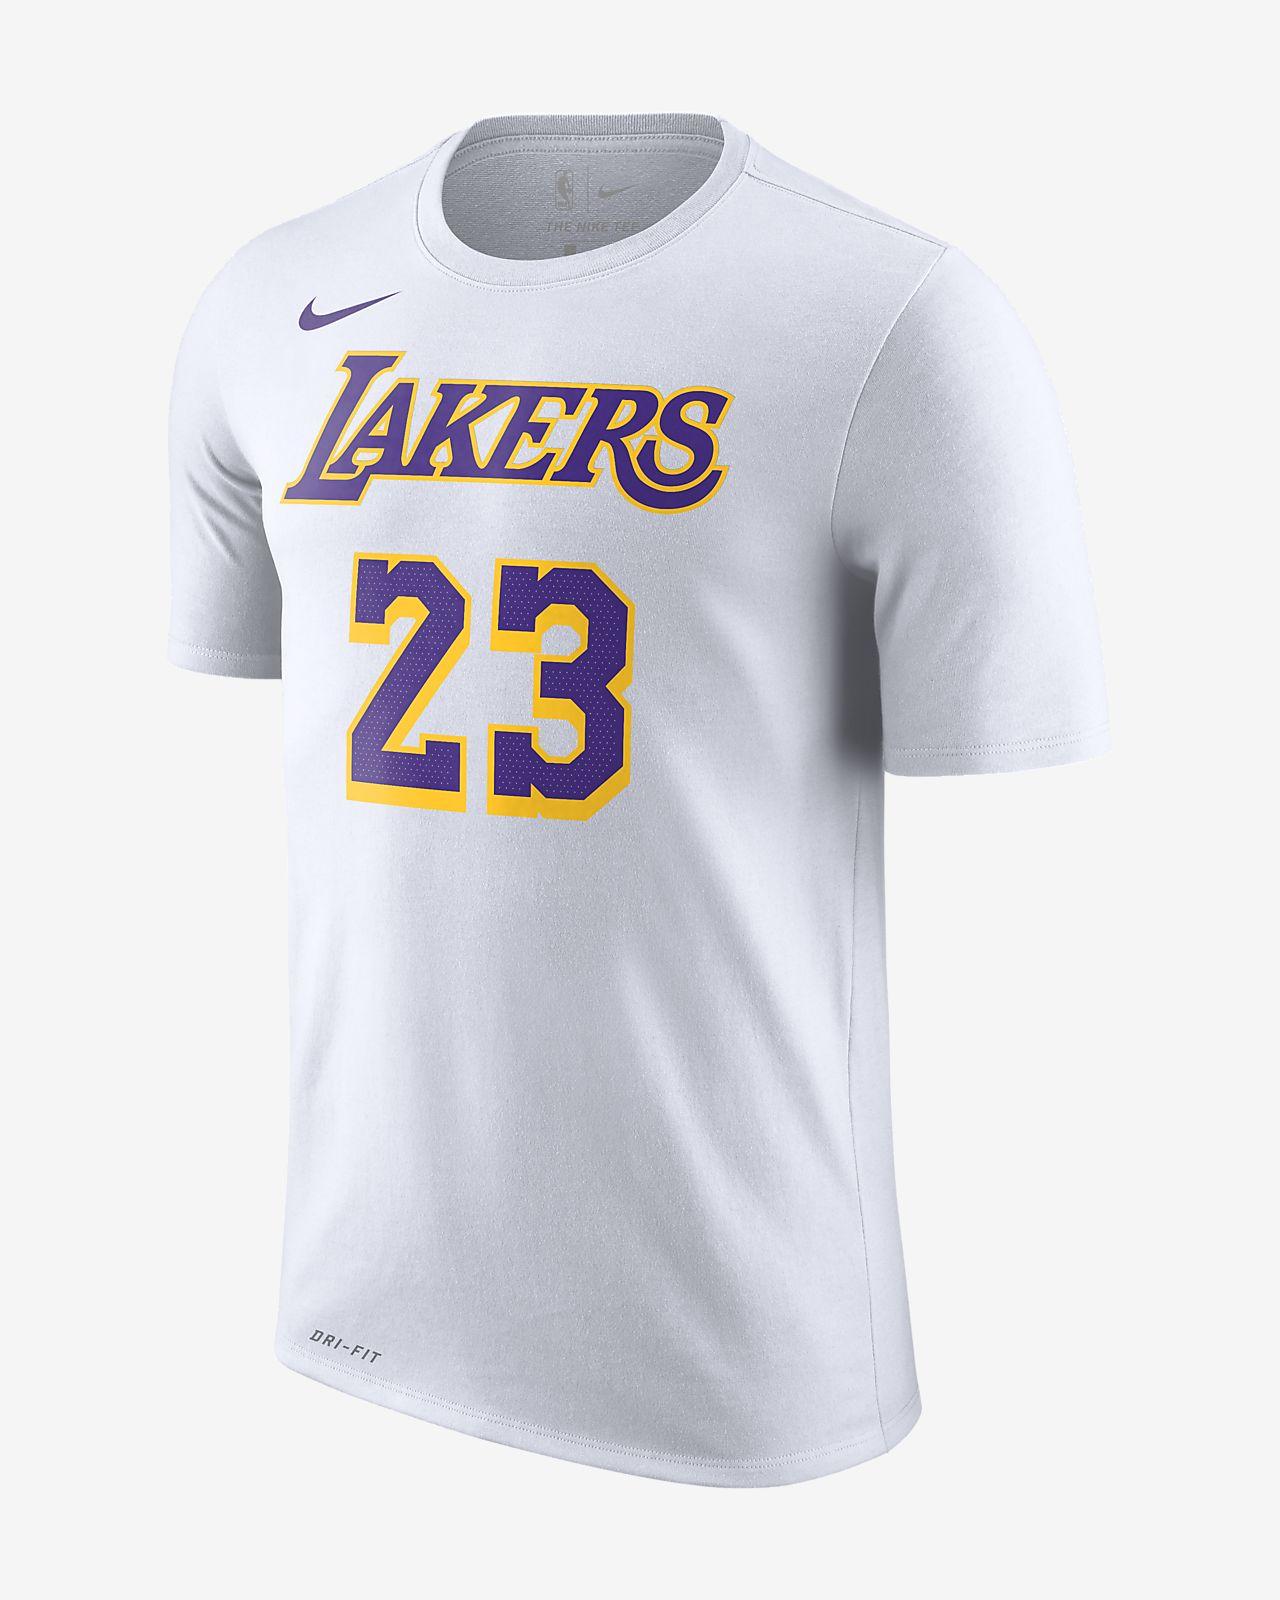 1b919fd645d Los Angeles Lakers Nike Dri-FIT Men s NBA T-Shirt. Nike.com GB